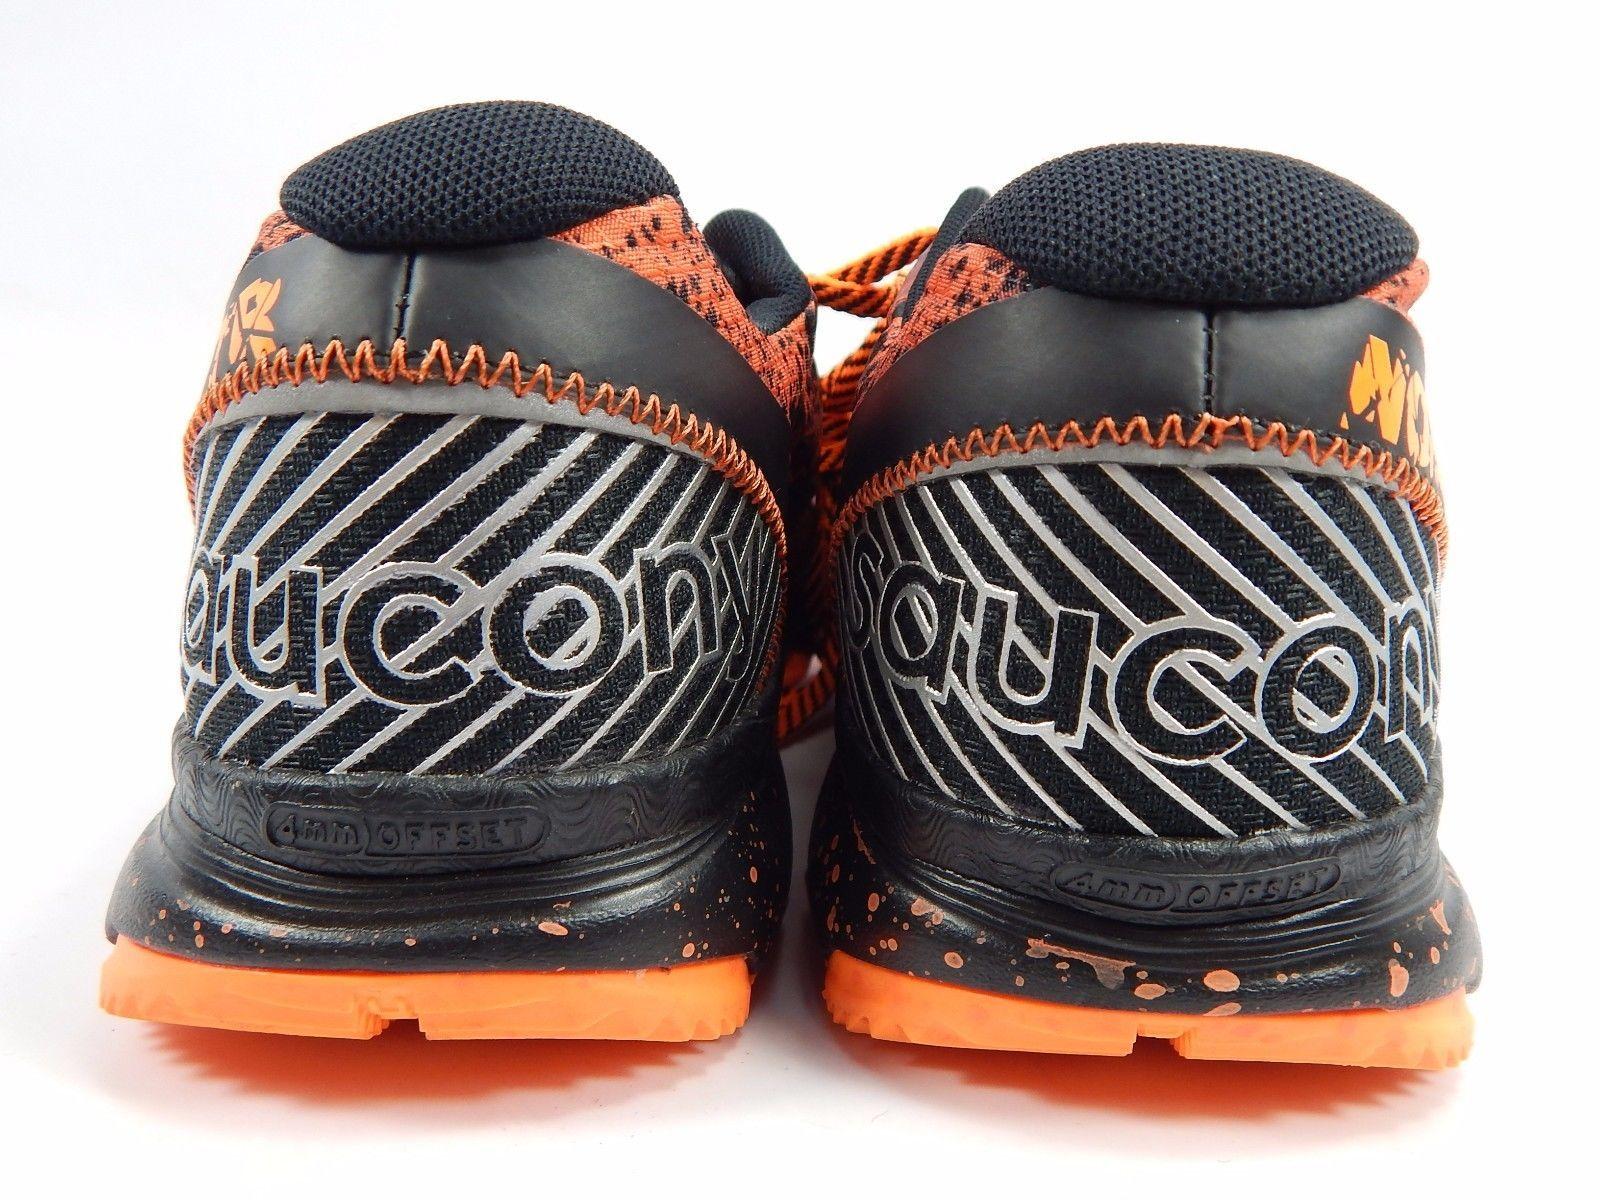 Saucony Nomad TR Men's Trail Running Shoes Sz US 9 M (D) EU 42.5 Red S20287-2